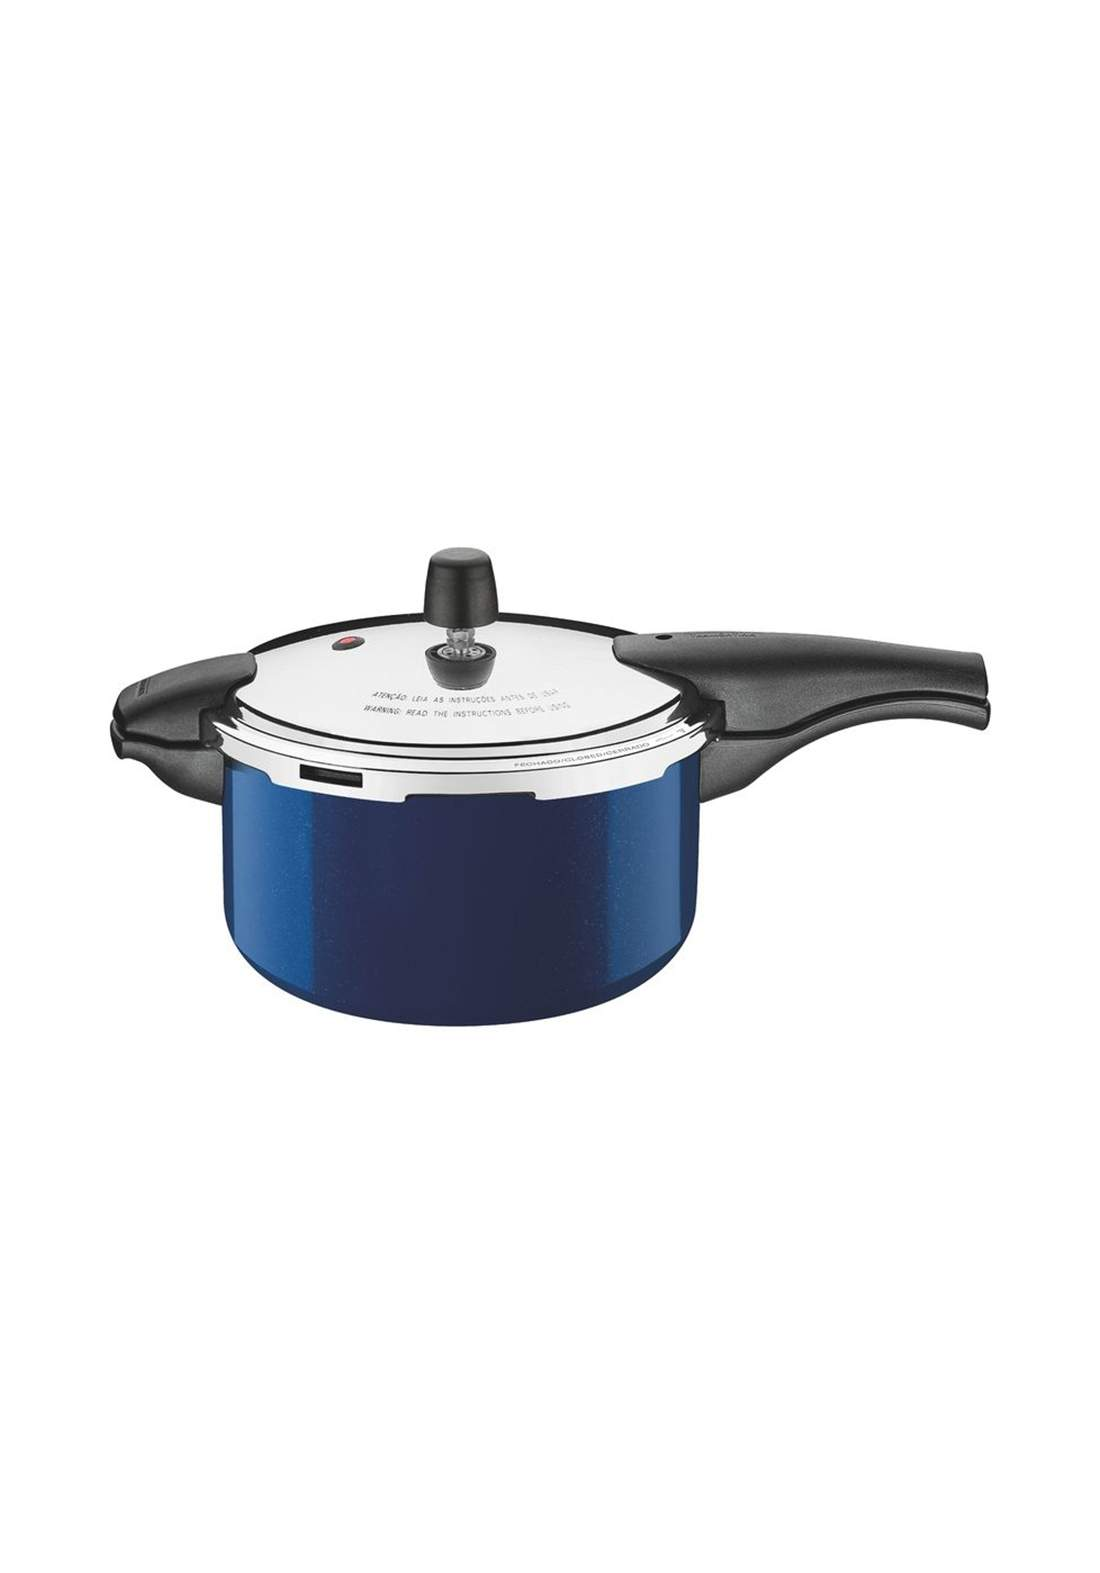 Tramontina '20588-124 Pressure Cooker 6 L Blue قدر ضغط